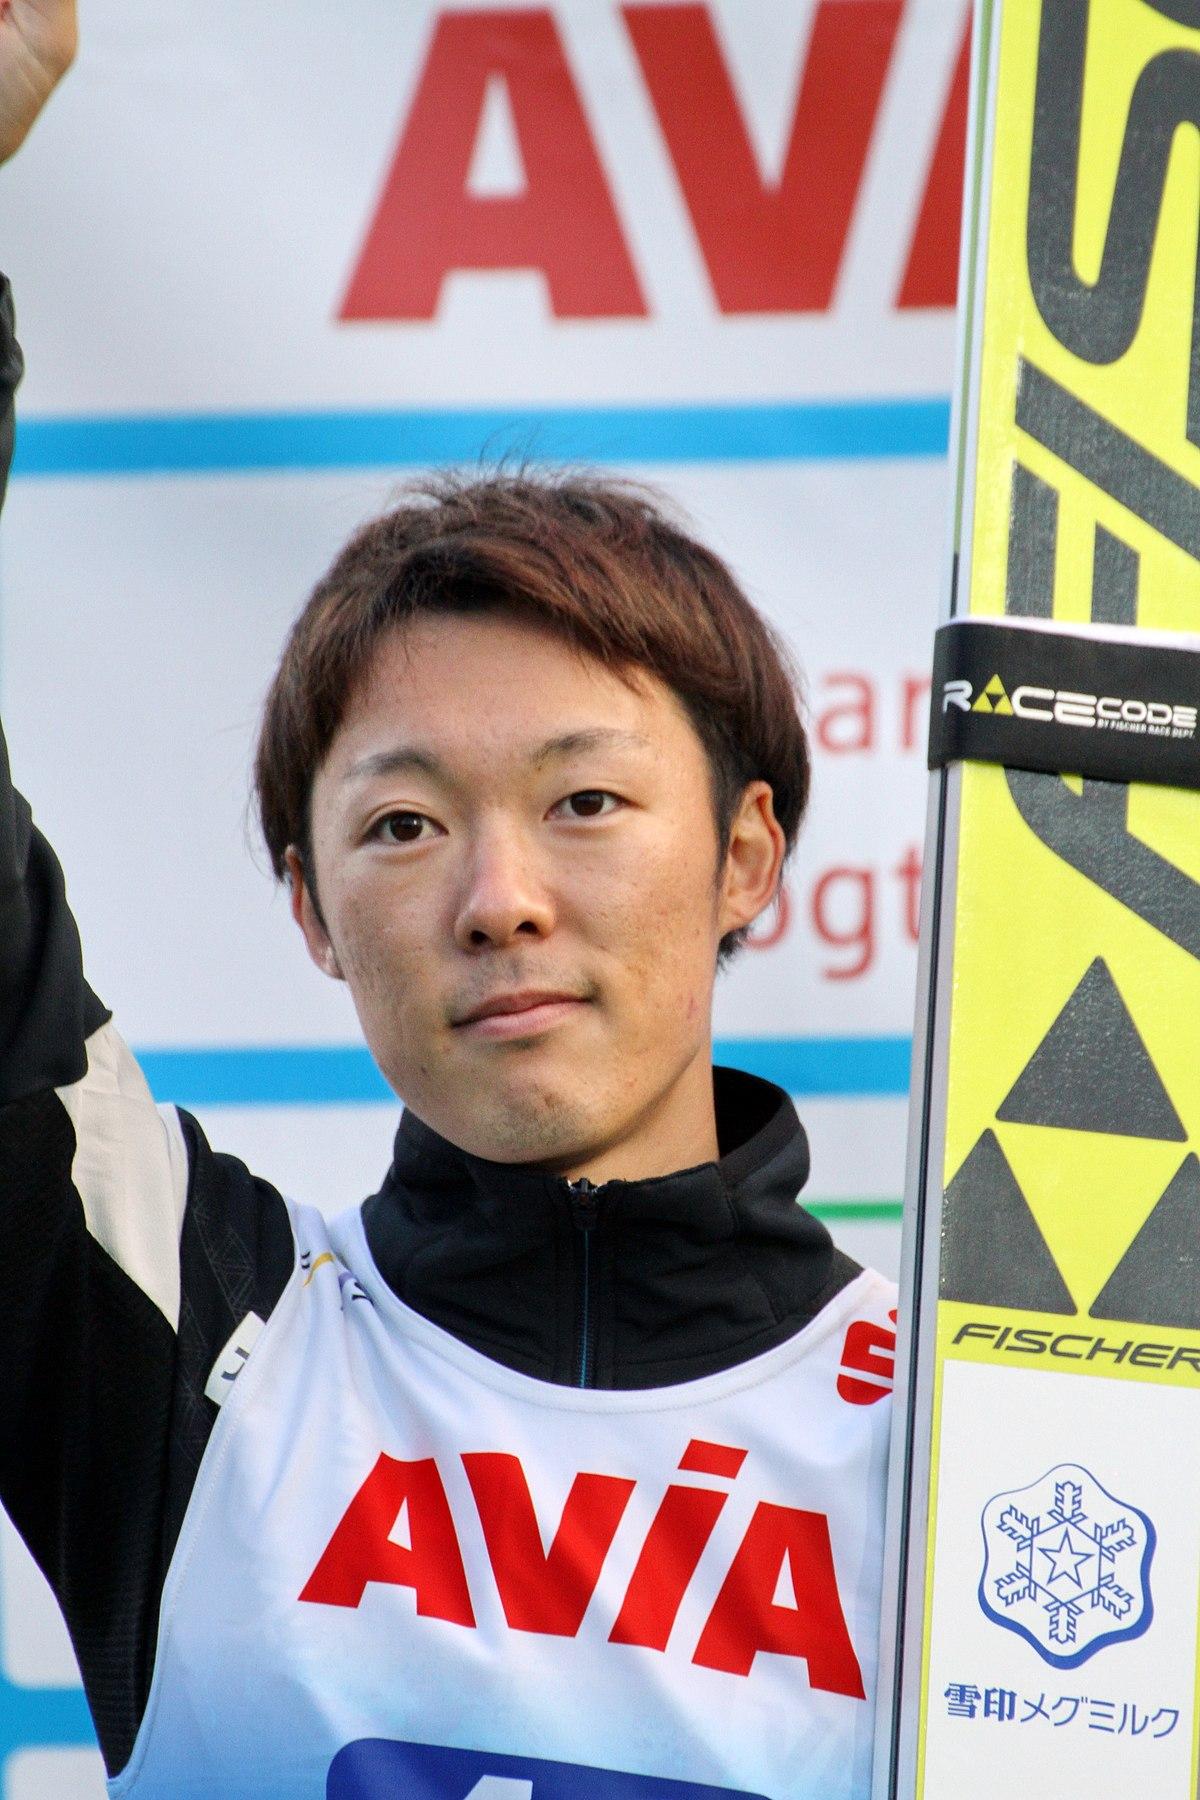 Ryōyū Kobayashi